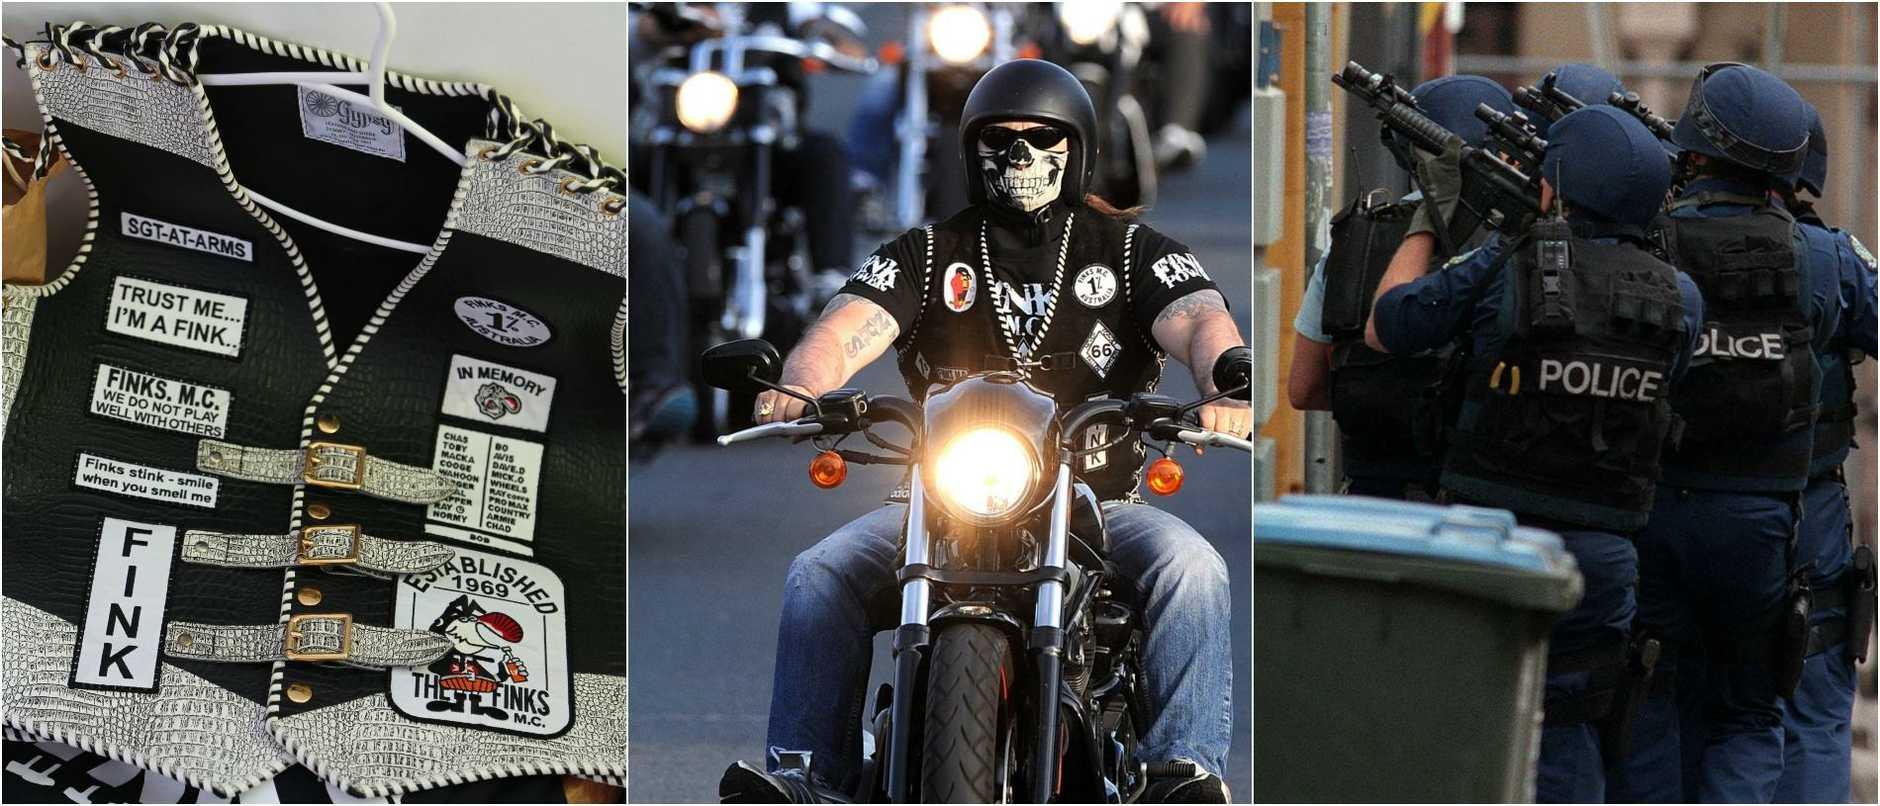 Bikie gangs are invading Brisbane.